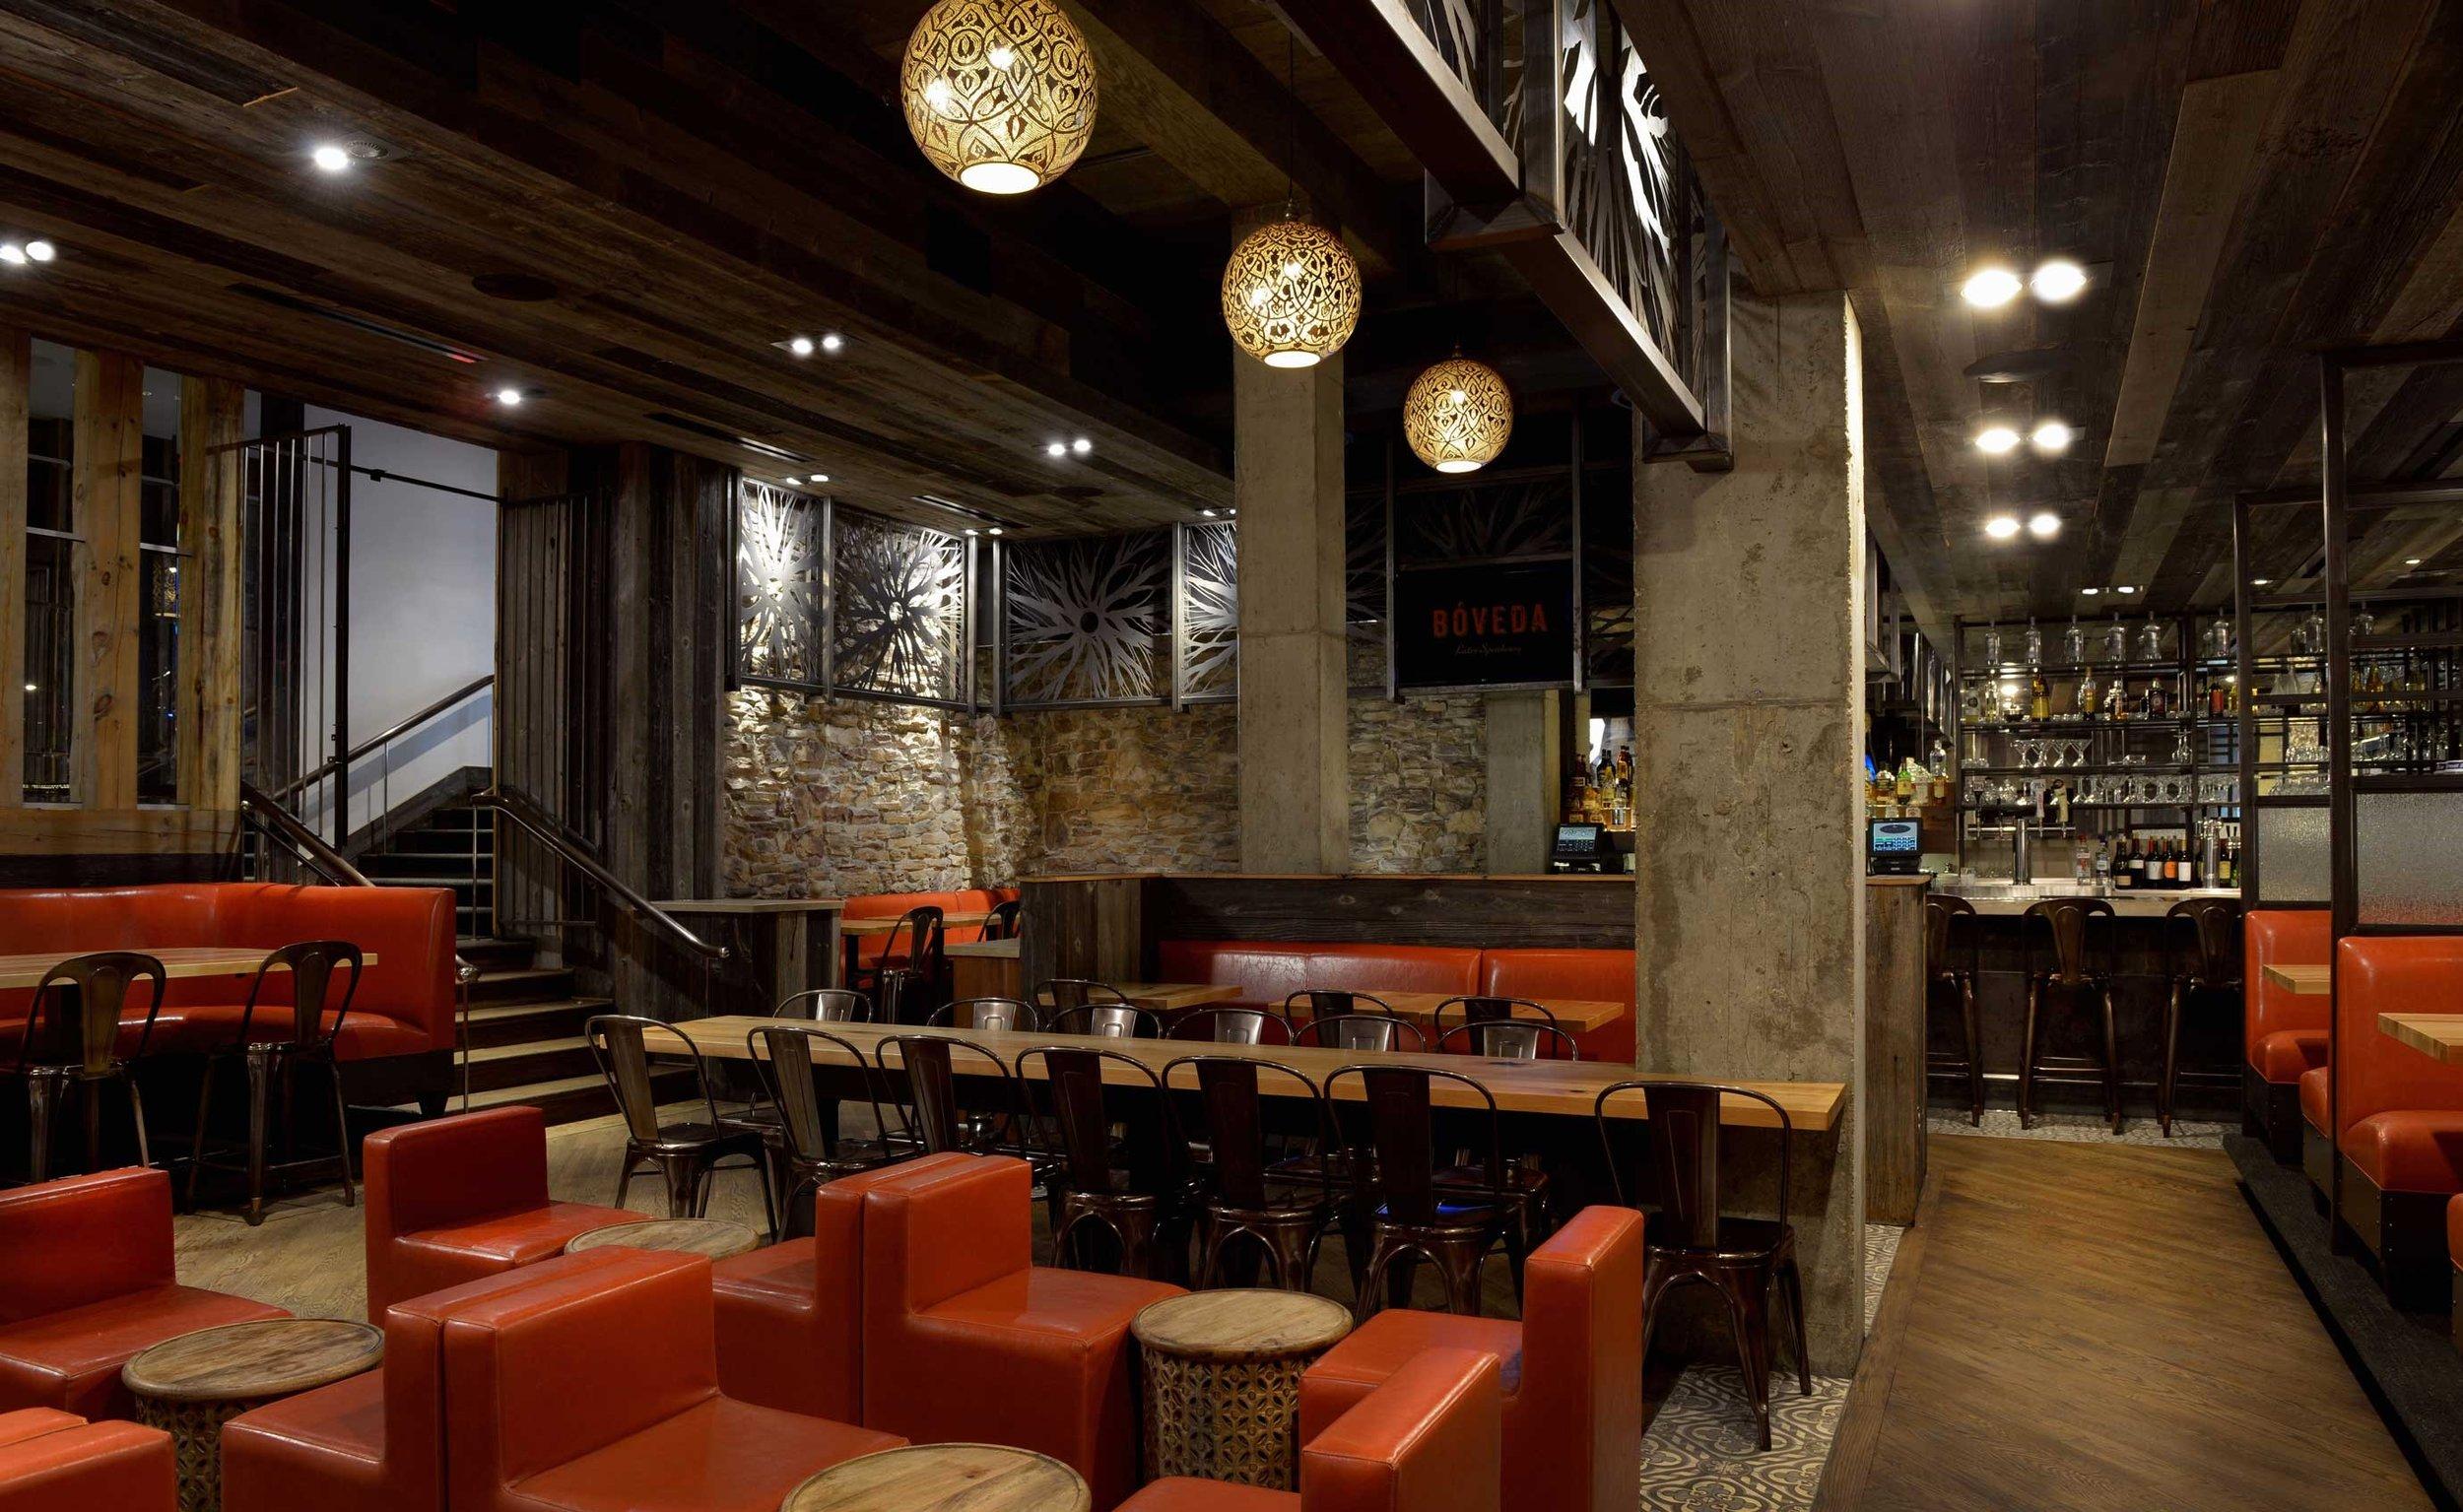 studio-saint-bars-and-restaurants-boveda-washington-dc-5